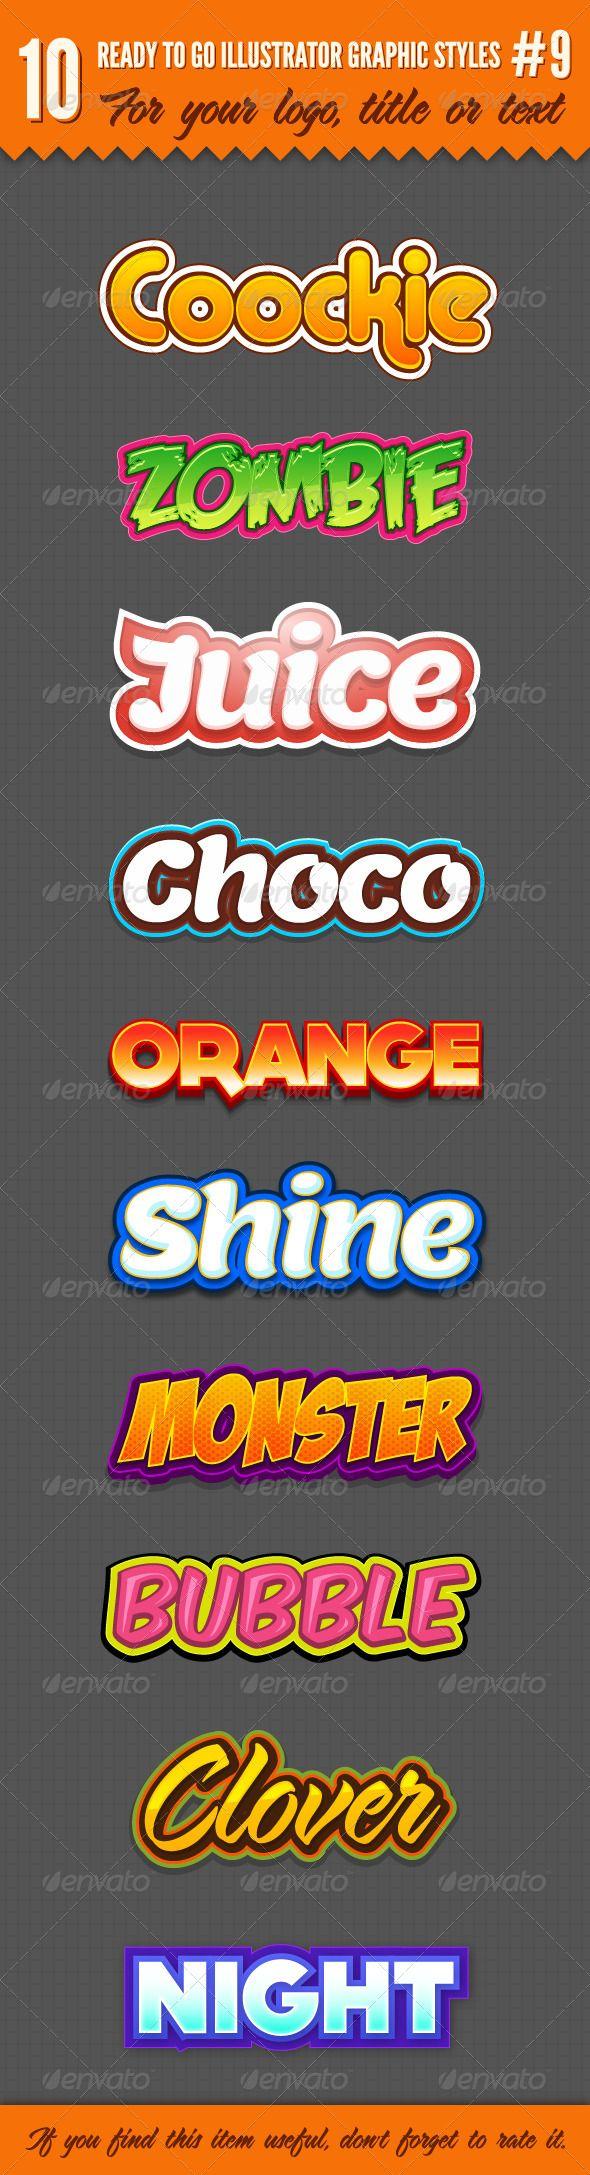 10 Logo Graphic Styles #9